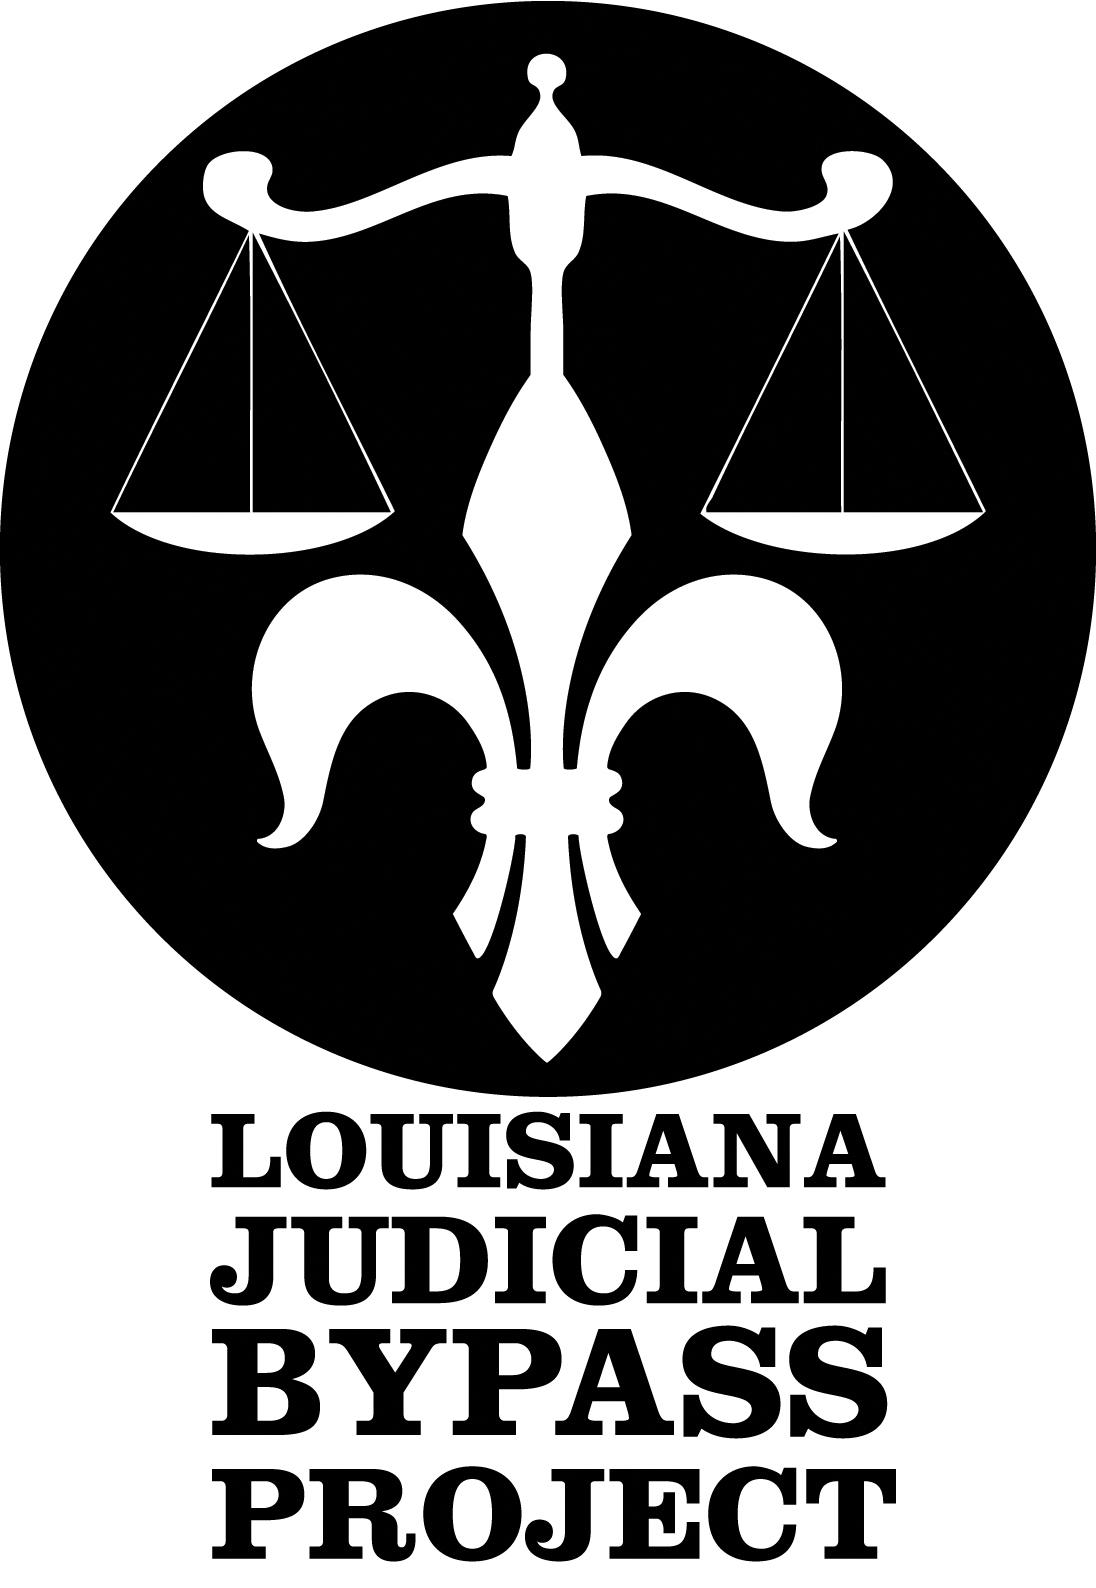 Louisiana Judicial Bypass Project